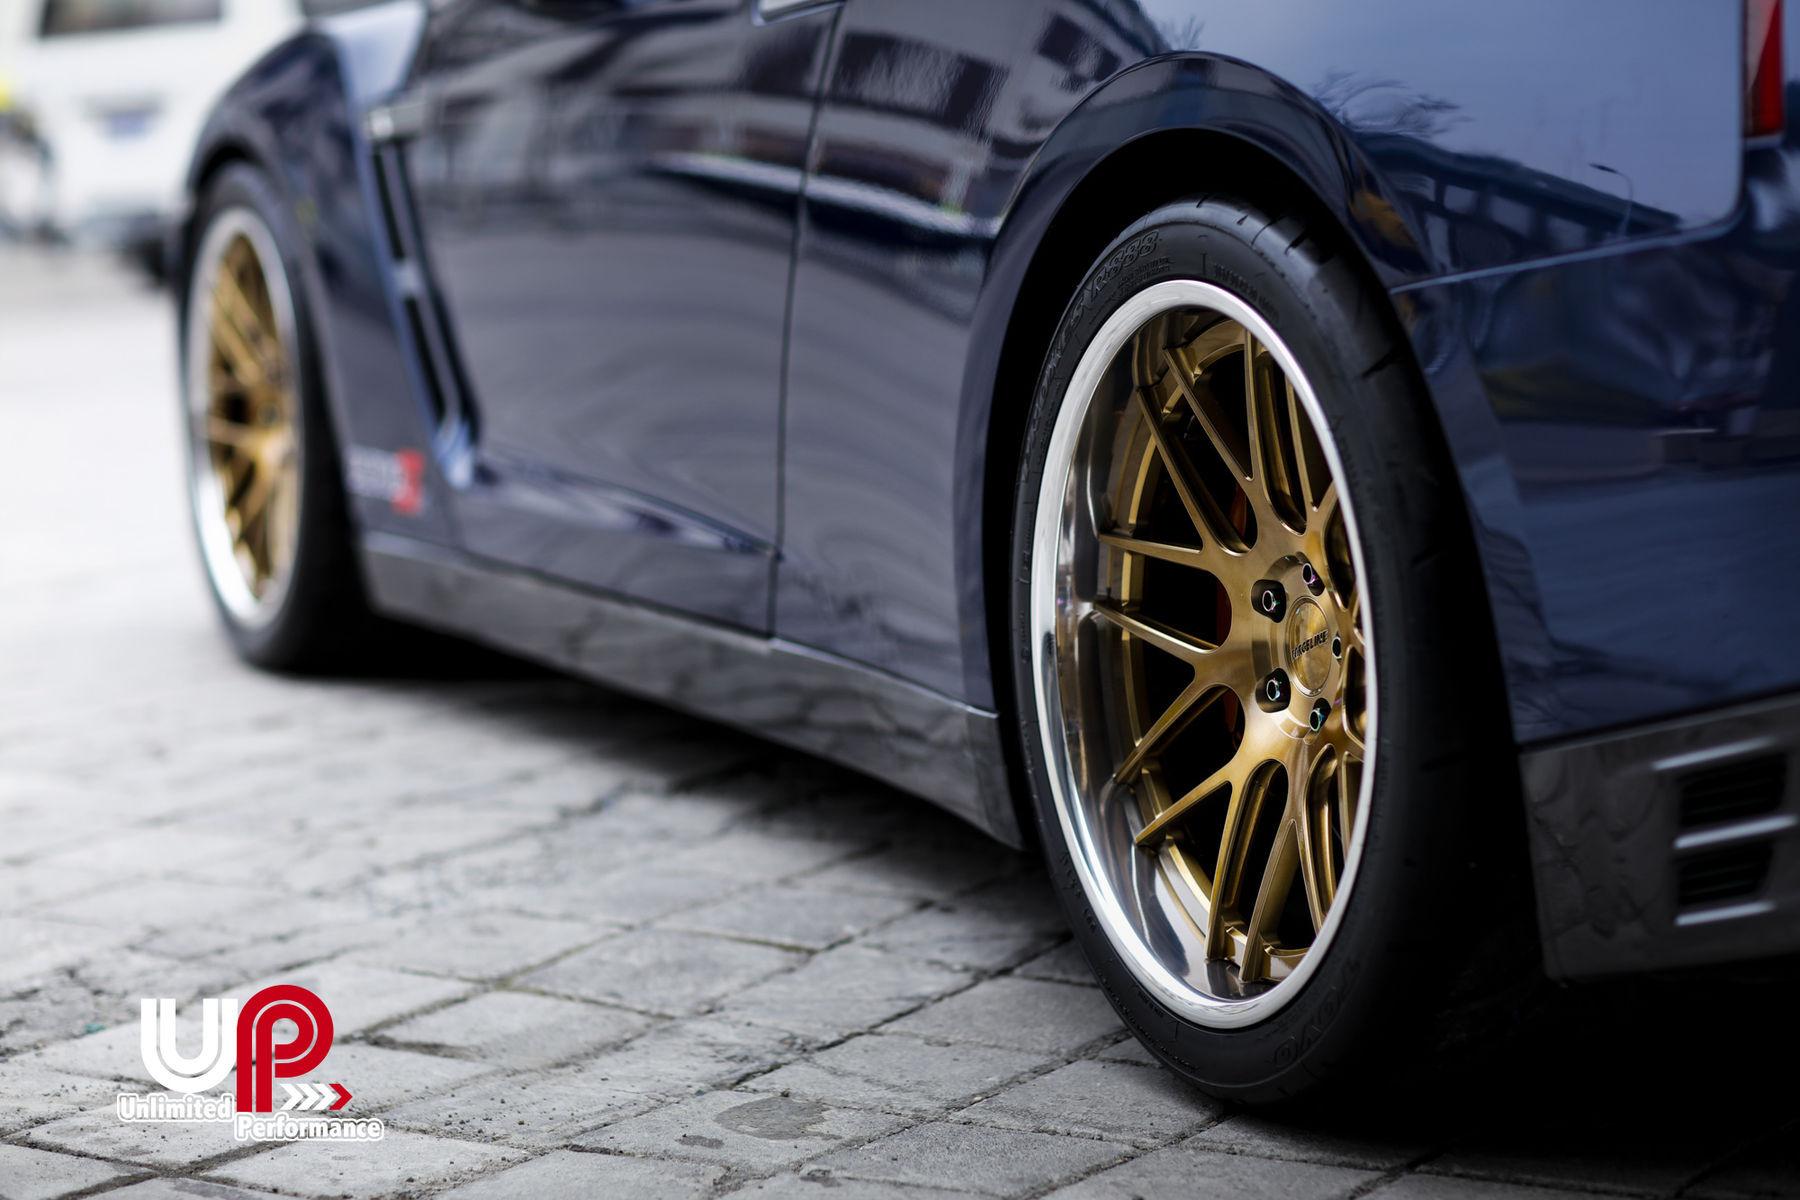 2015 Nissan GT-R   AMS Alpha 7-Powered R35 Nissan GT-R on Forgeline DE3C Concave Wheels